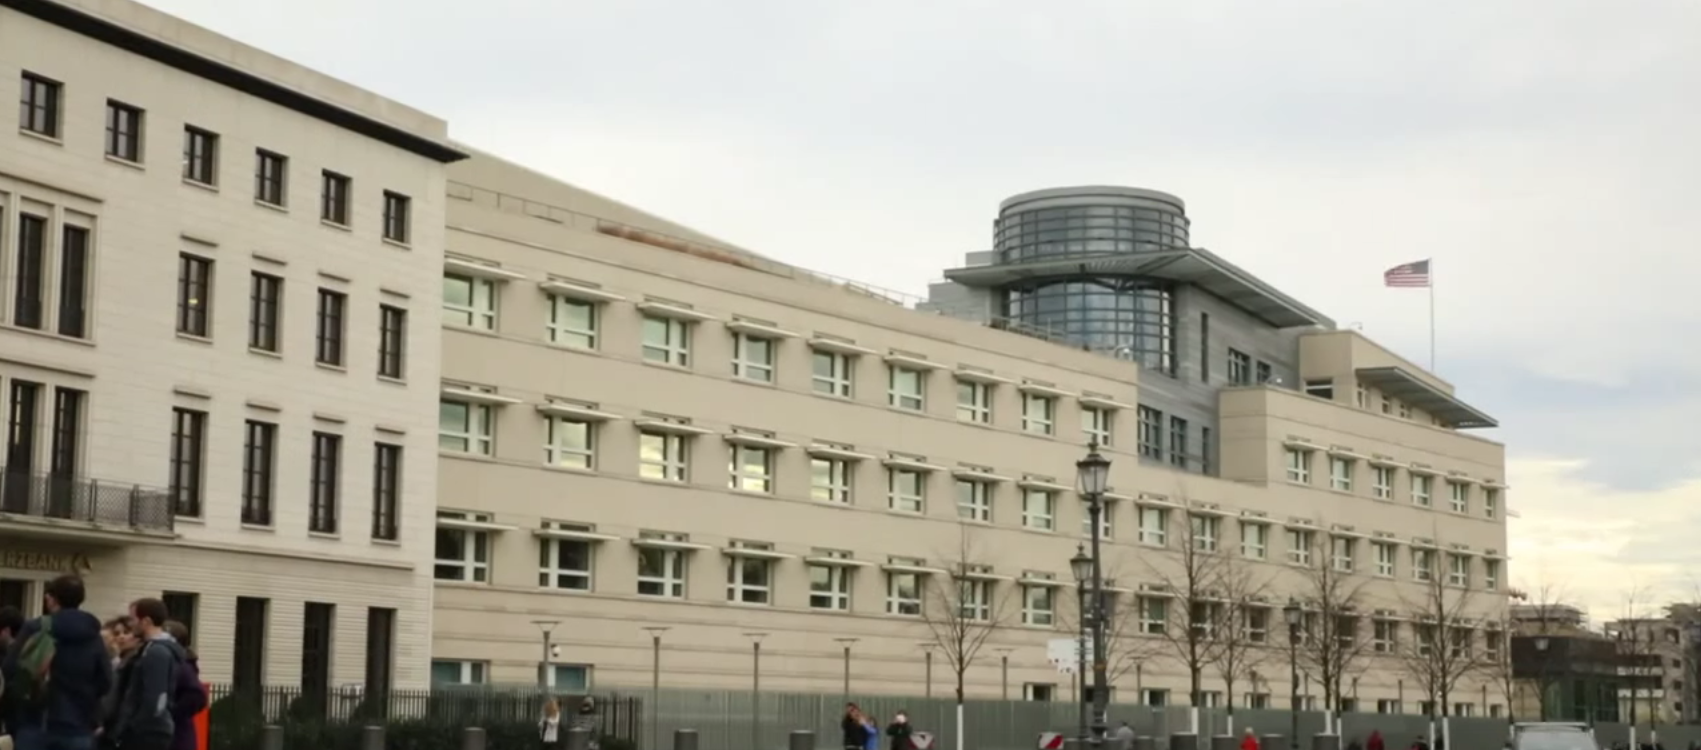 U.S. Embassy In Berlin (Screen capture- Tech crunch You Tube video)